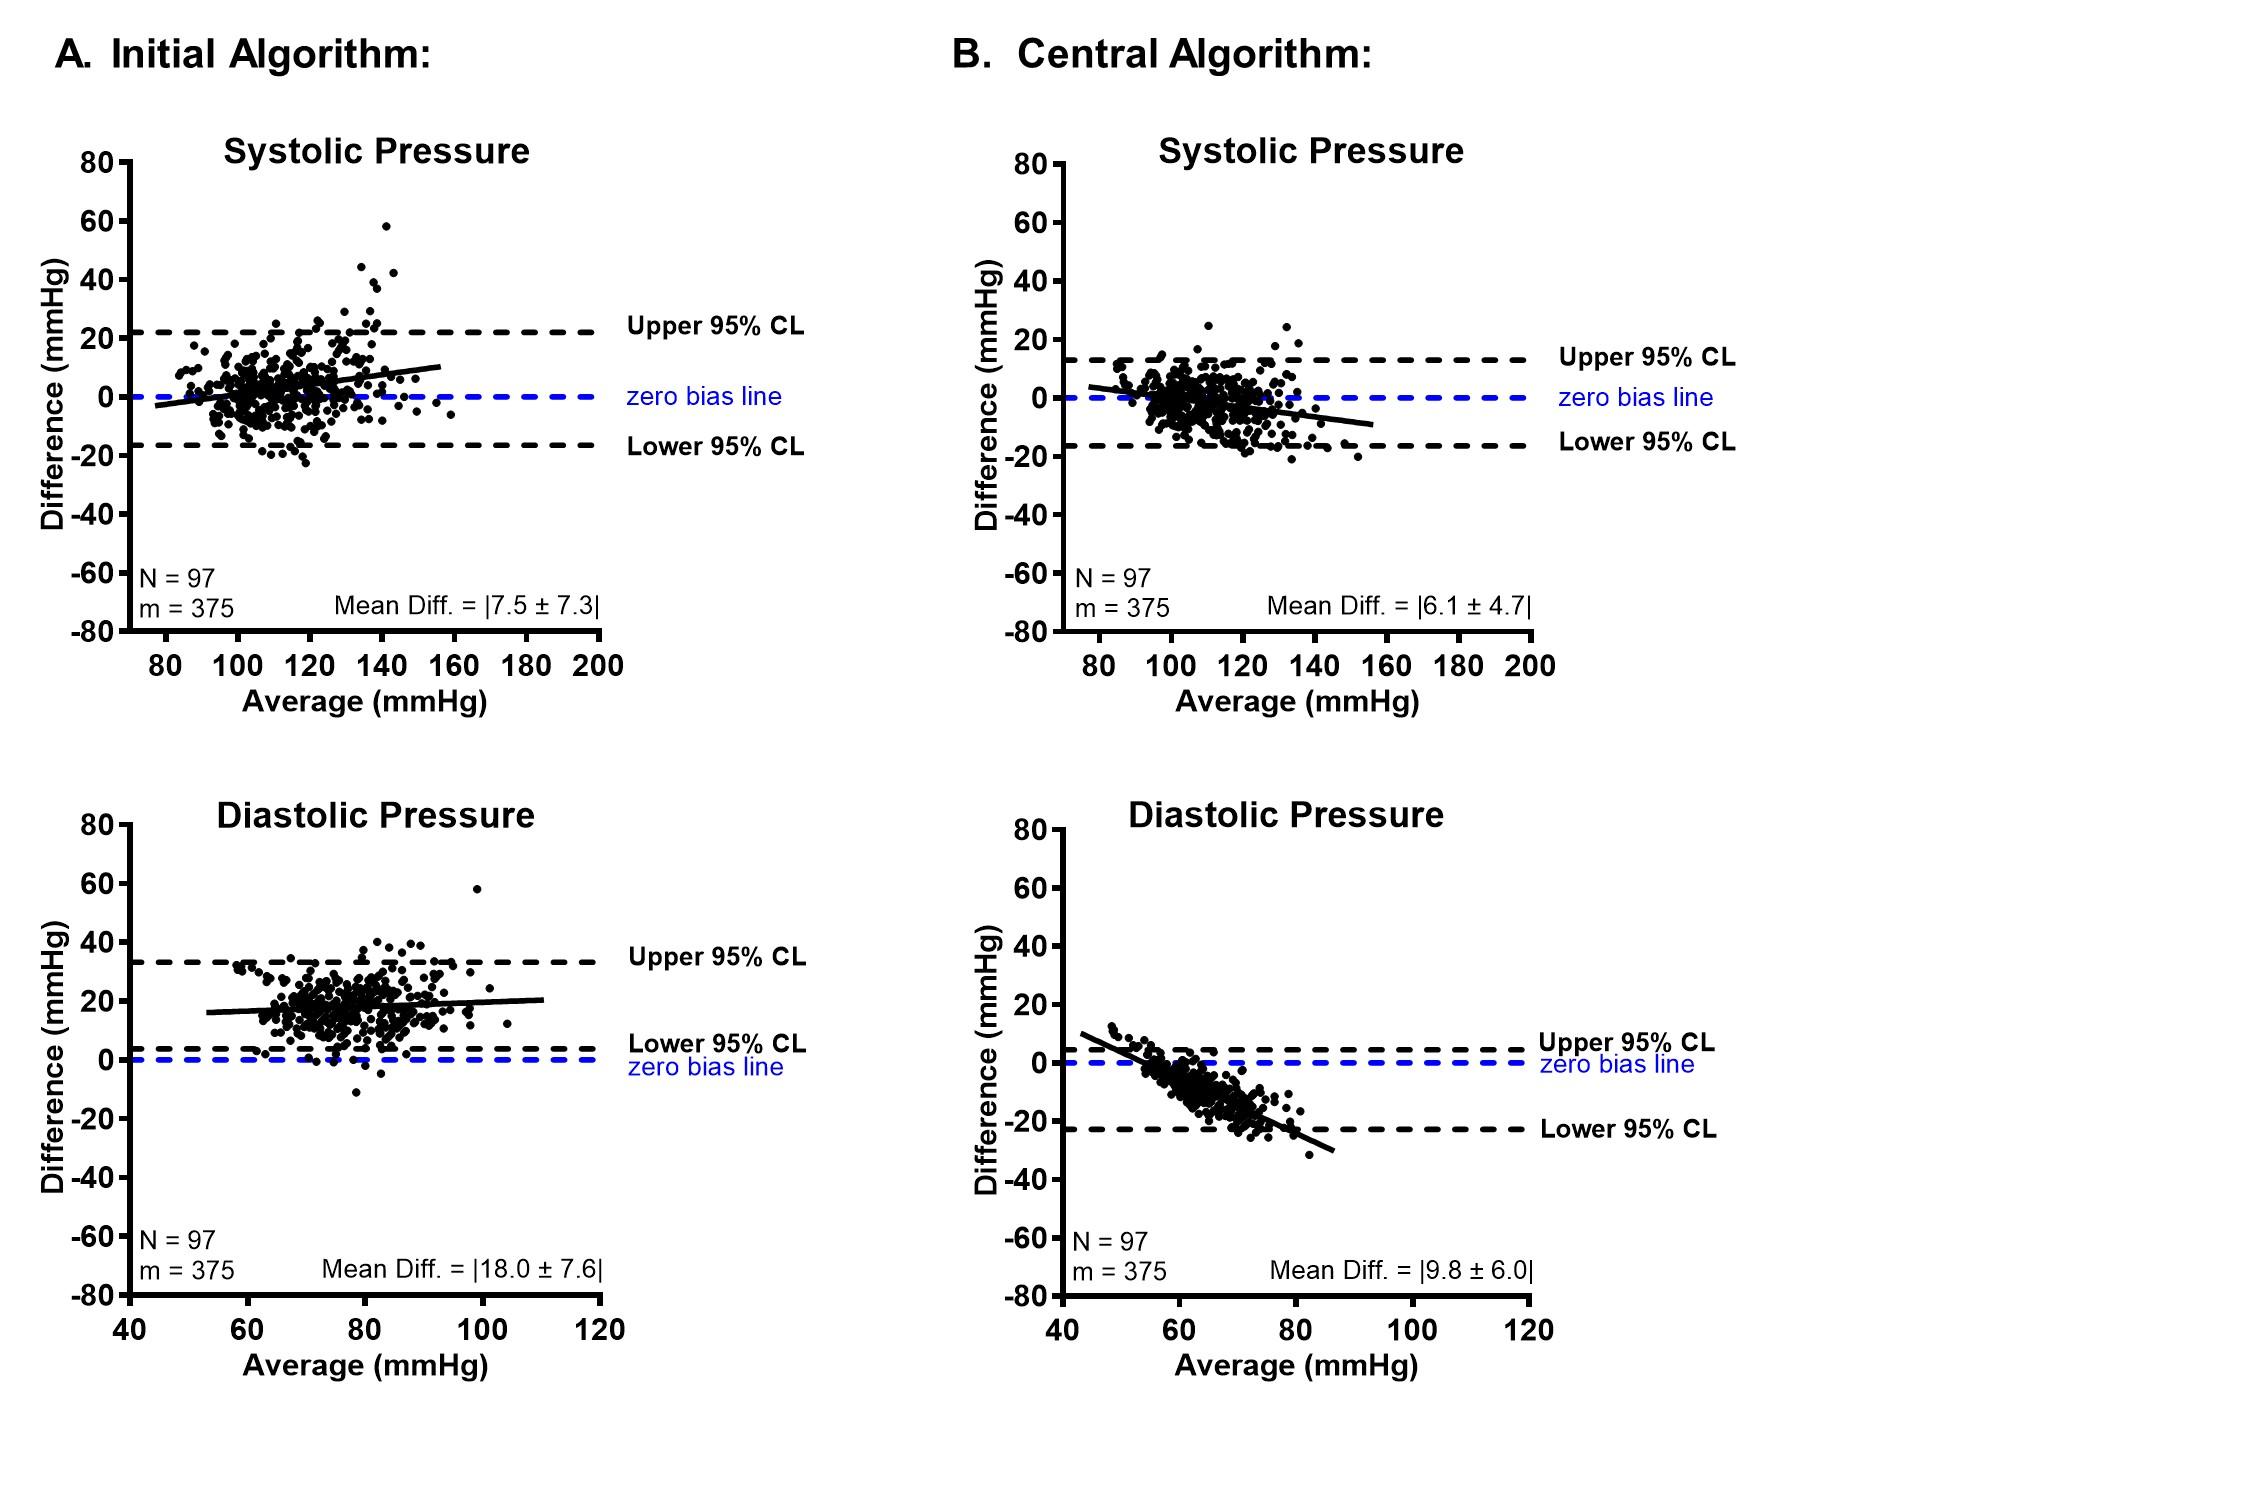 JMIR - A Comparison and Calibration of a Wrist-Worn Blood